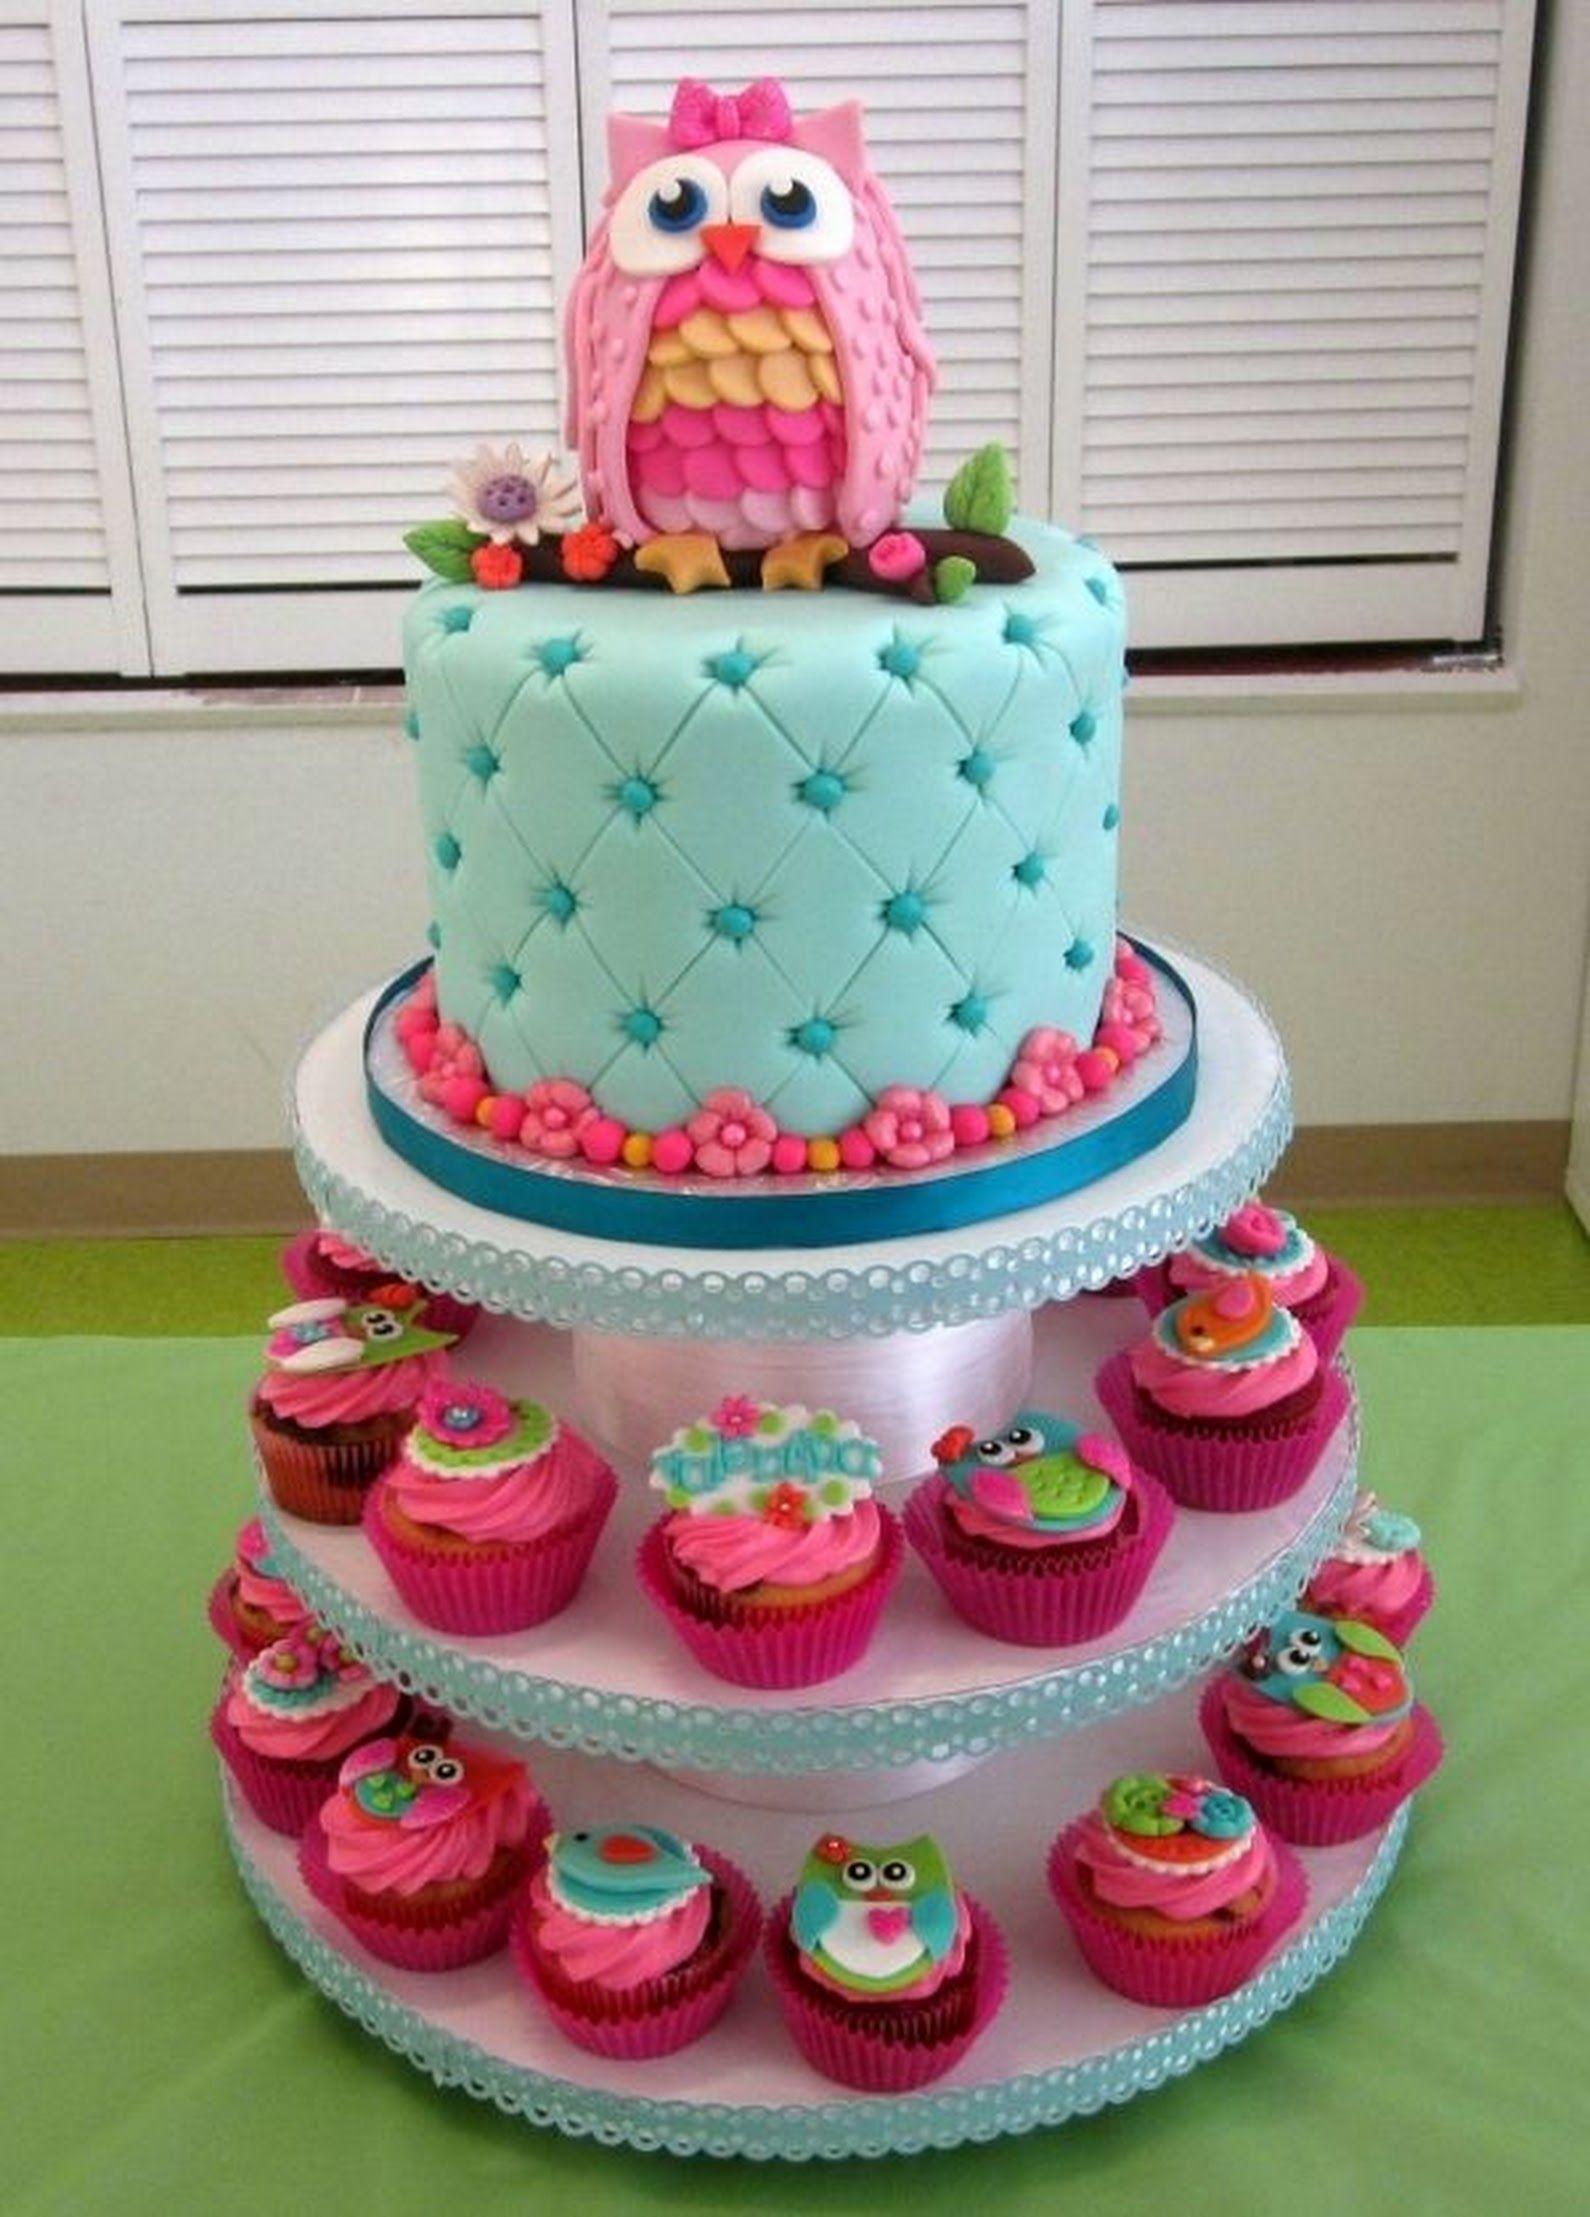 Owls 3D Cake  Haa Liukim  Google+